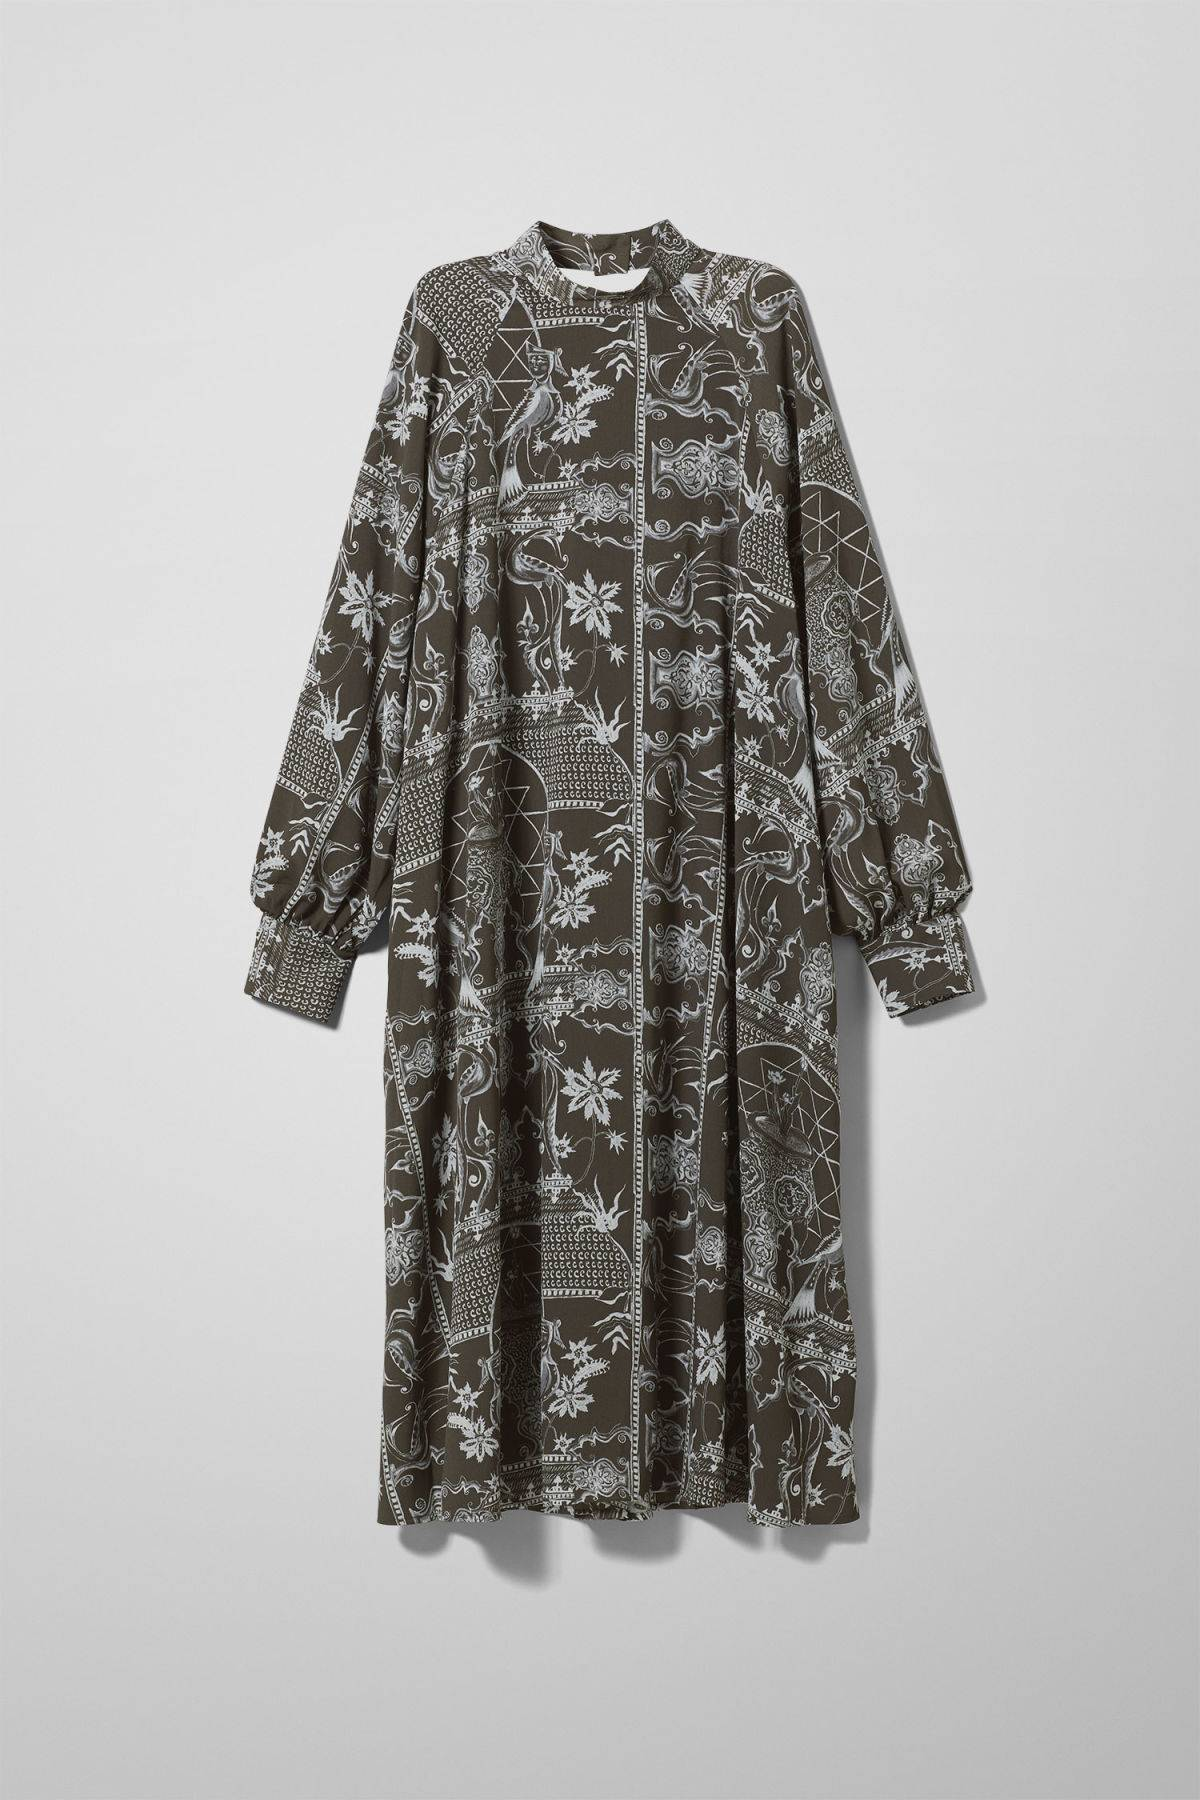 Image of Ethel Dress - Black-M